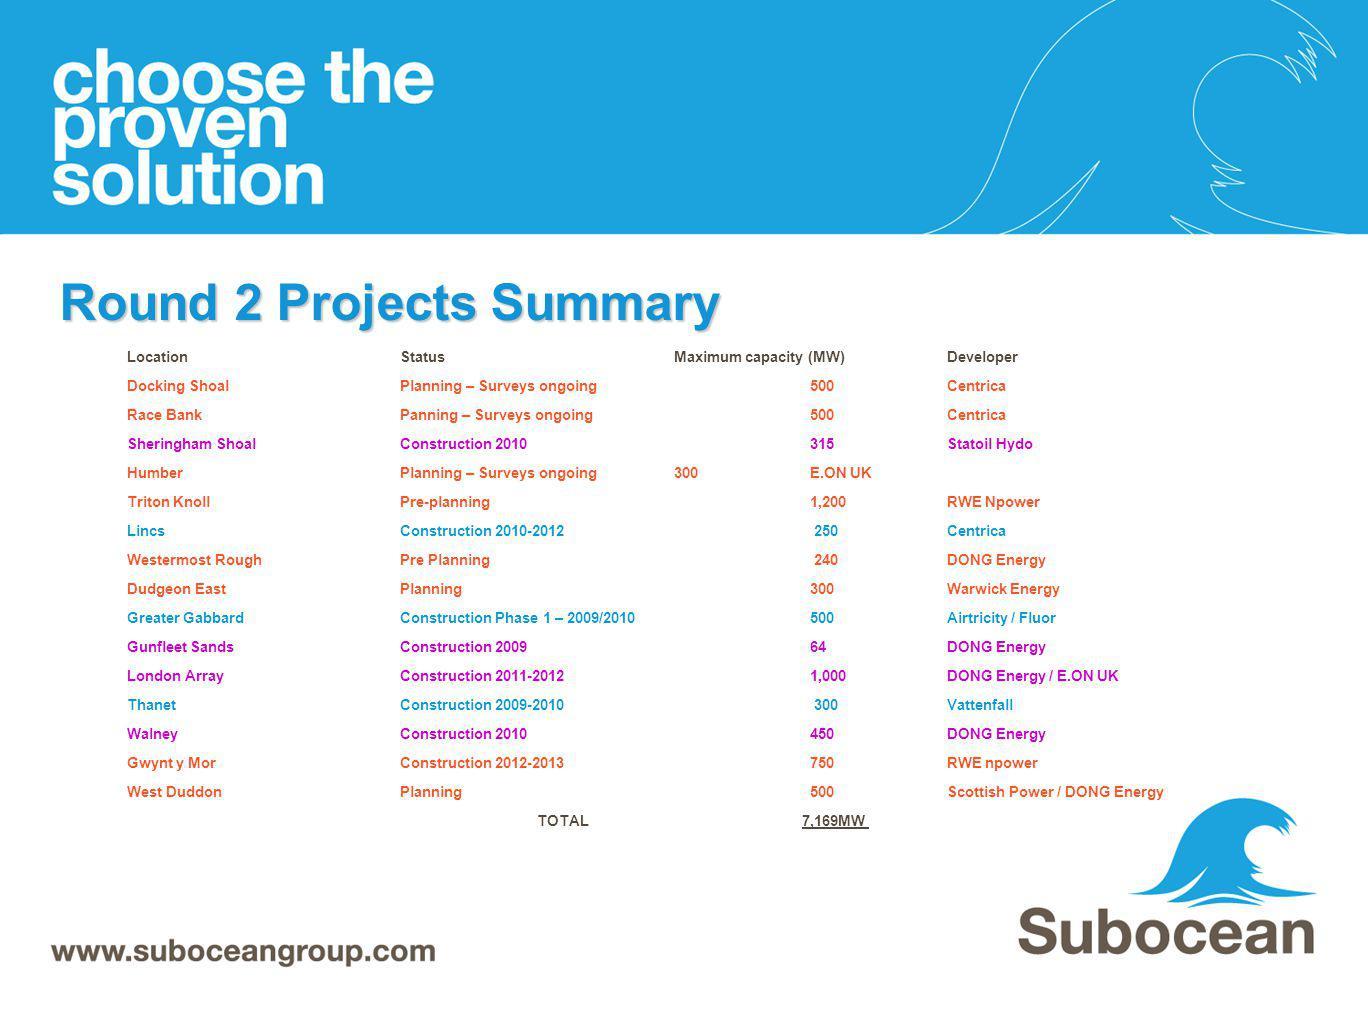 Round 2 Projects Summary LocationStatusMaximum capacity (MW)Developer Docking Shoal Planning – Surveys ongoing 500Centrica Race BankPanning – Surveys